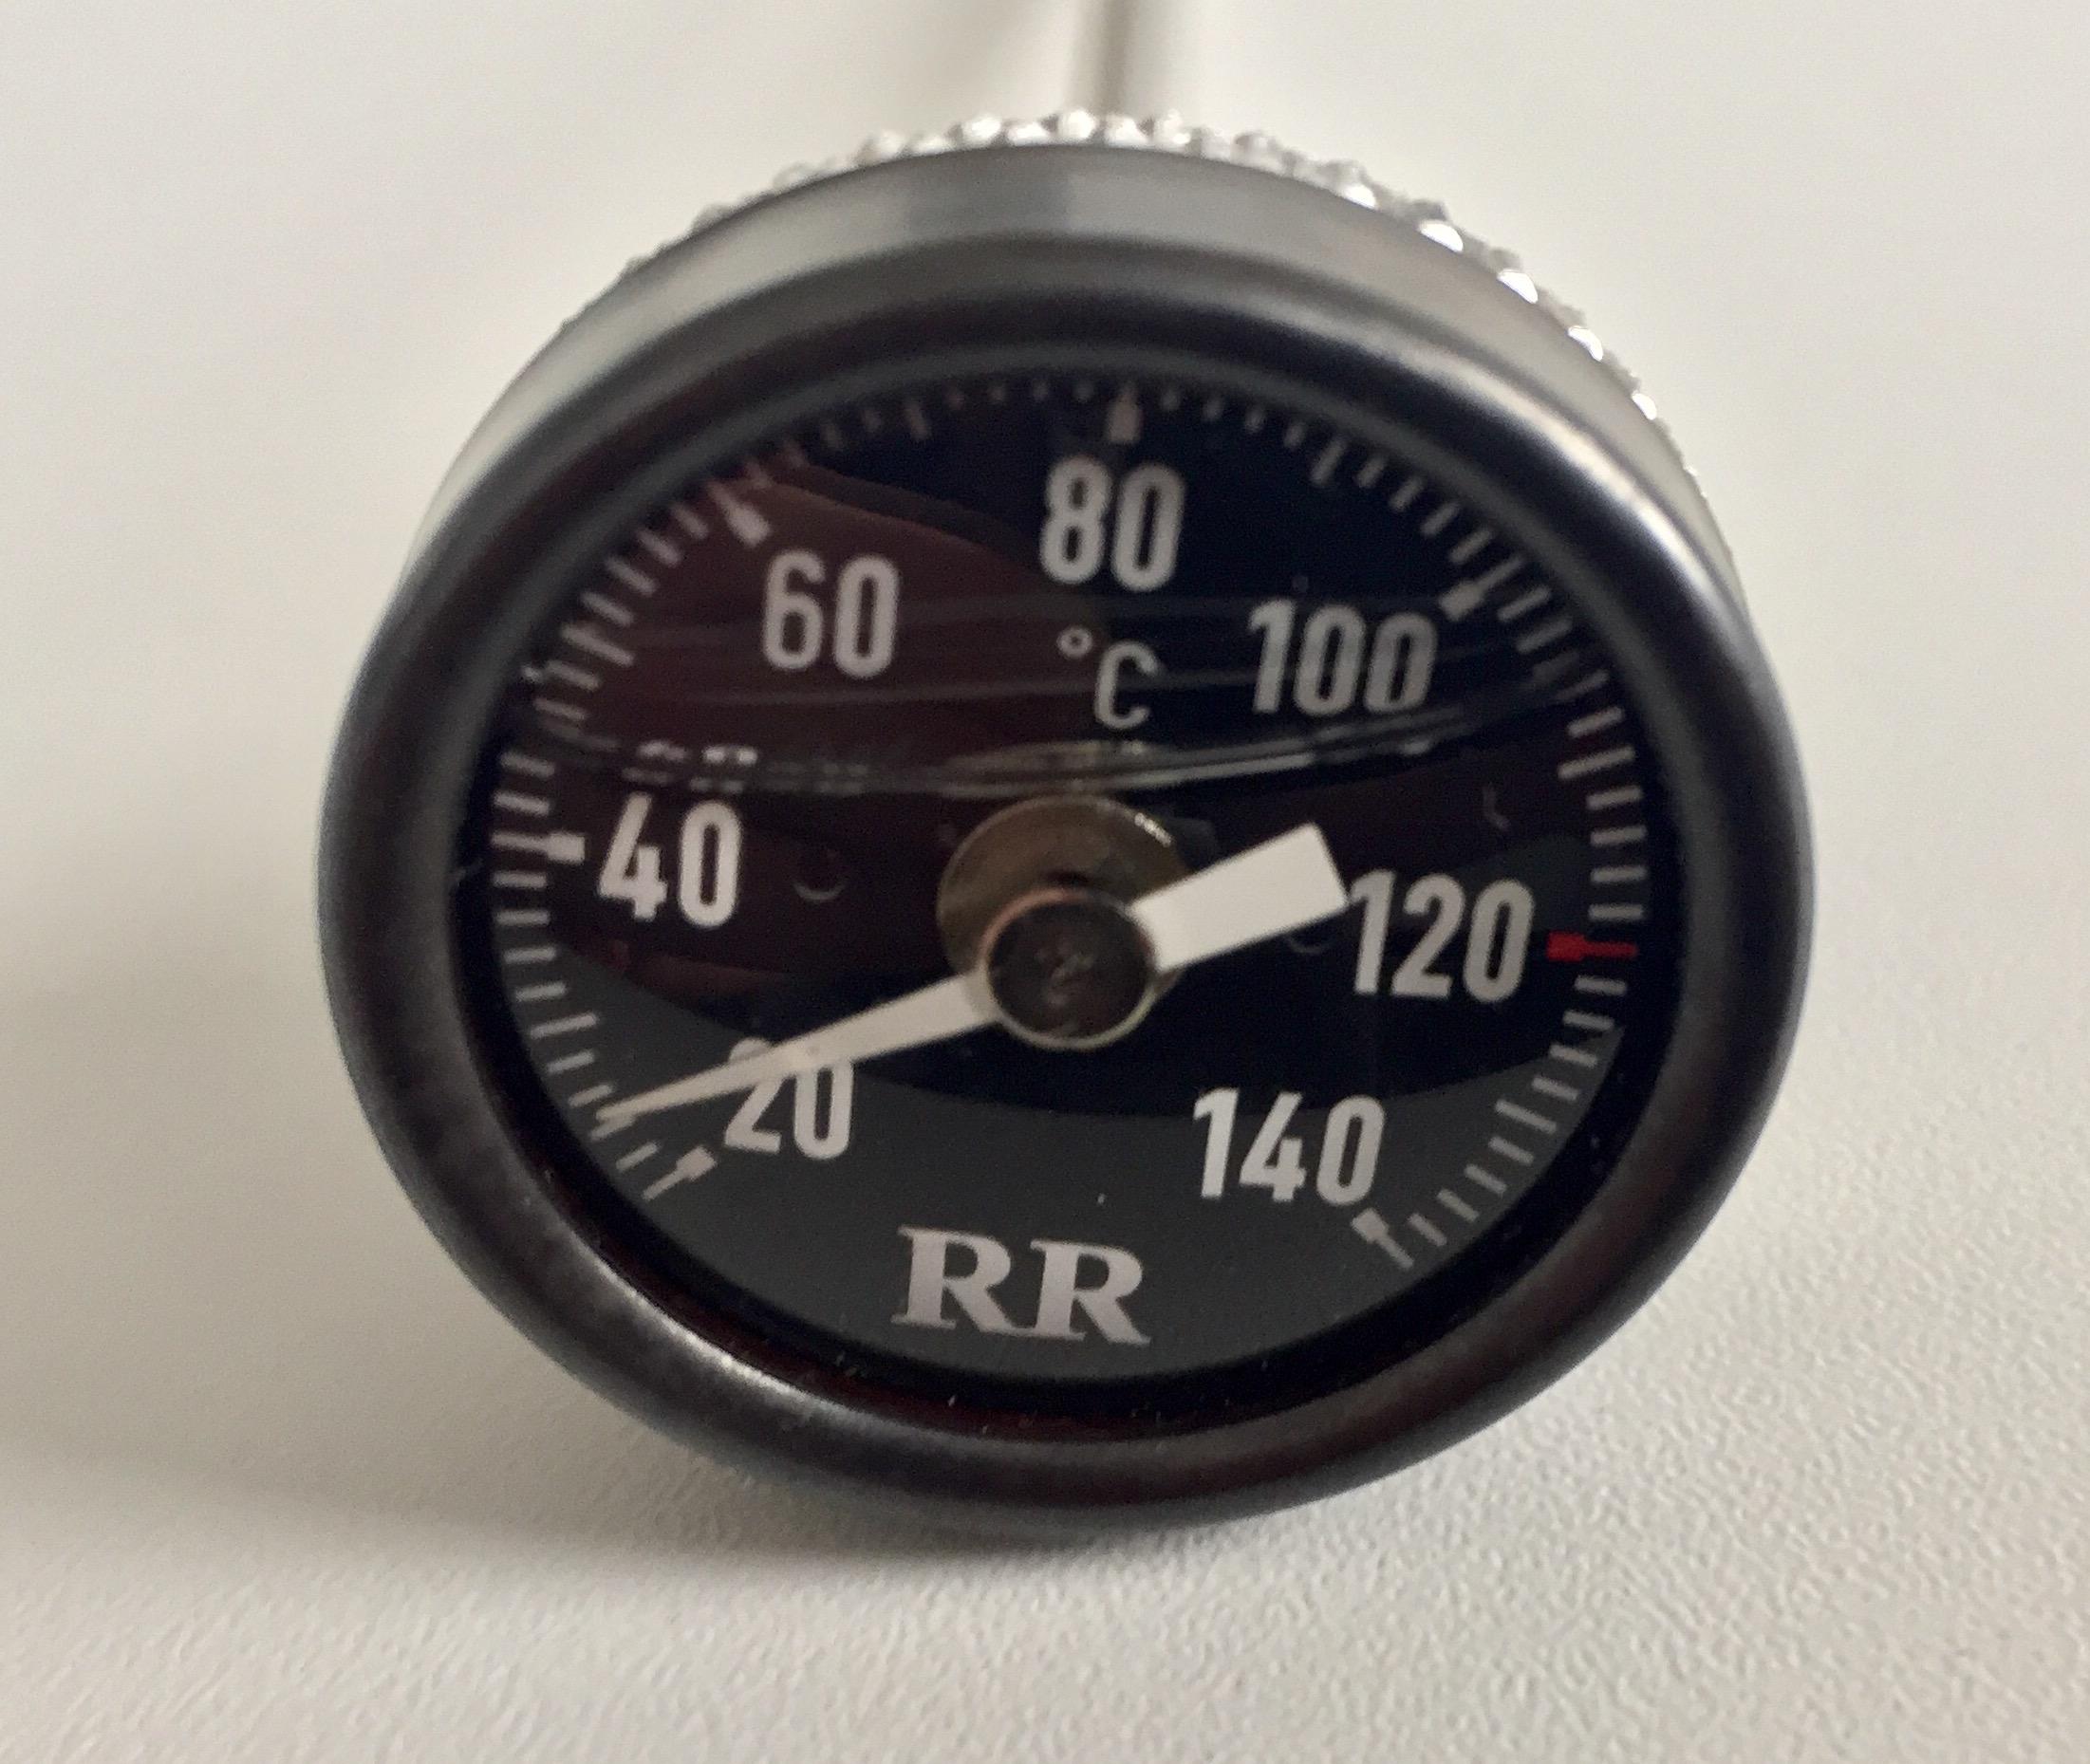 rr_-lthermometer_1.jpg